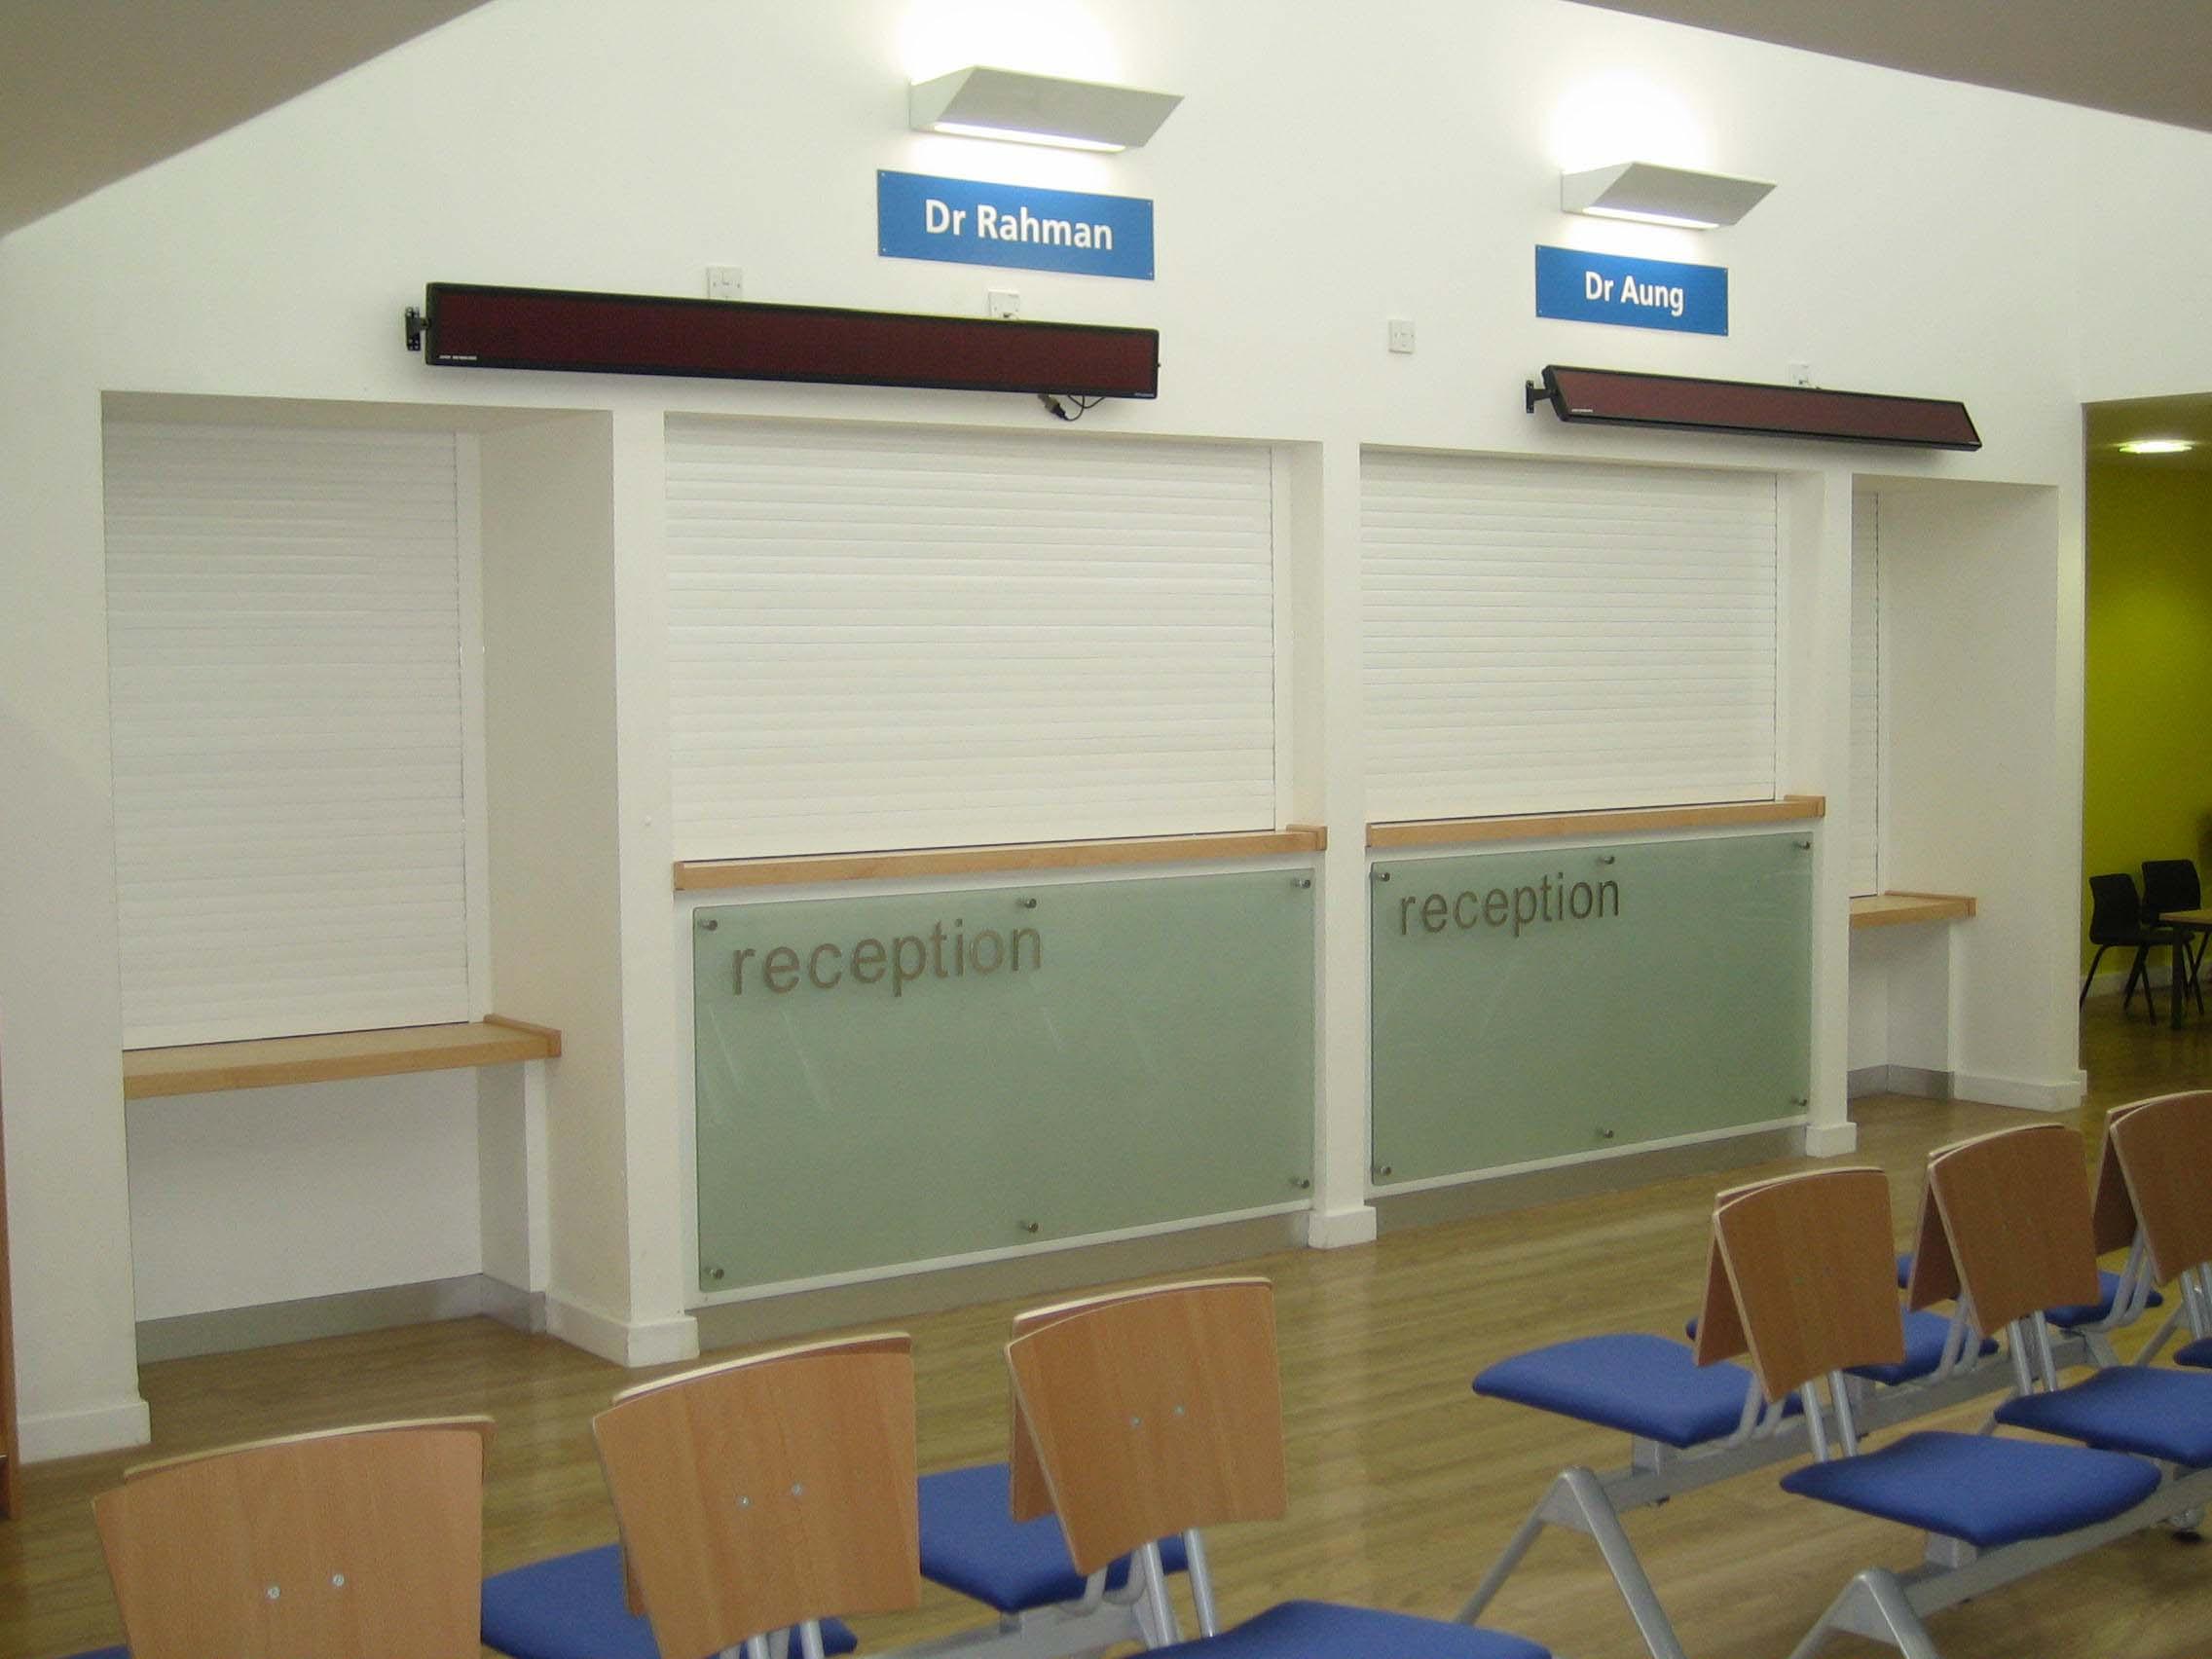 Reception shutters